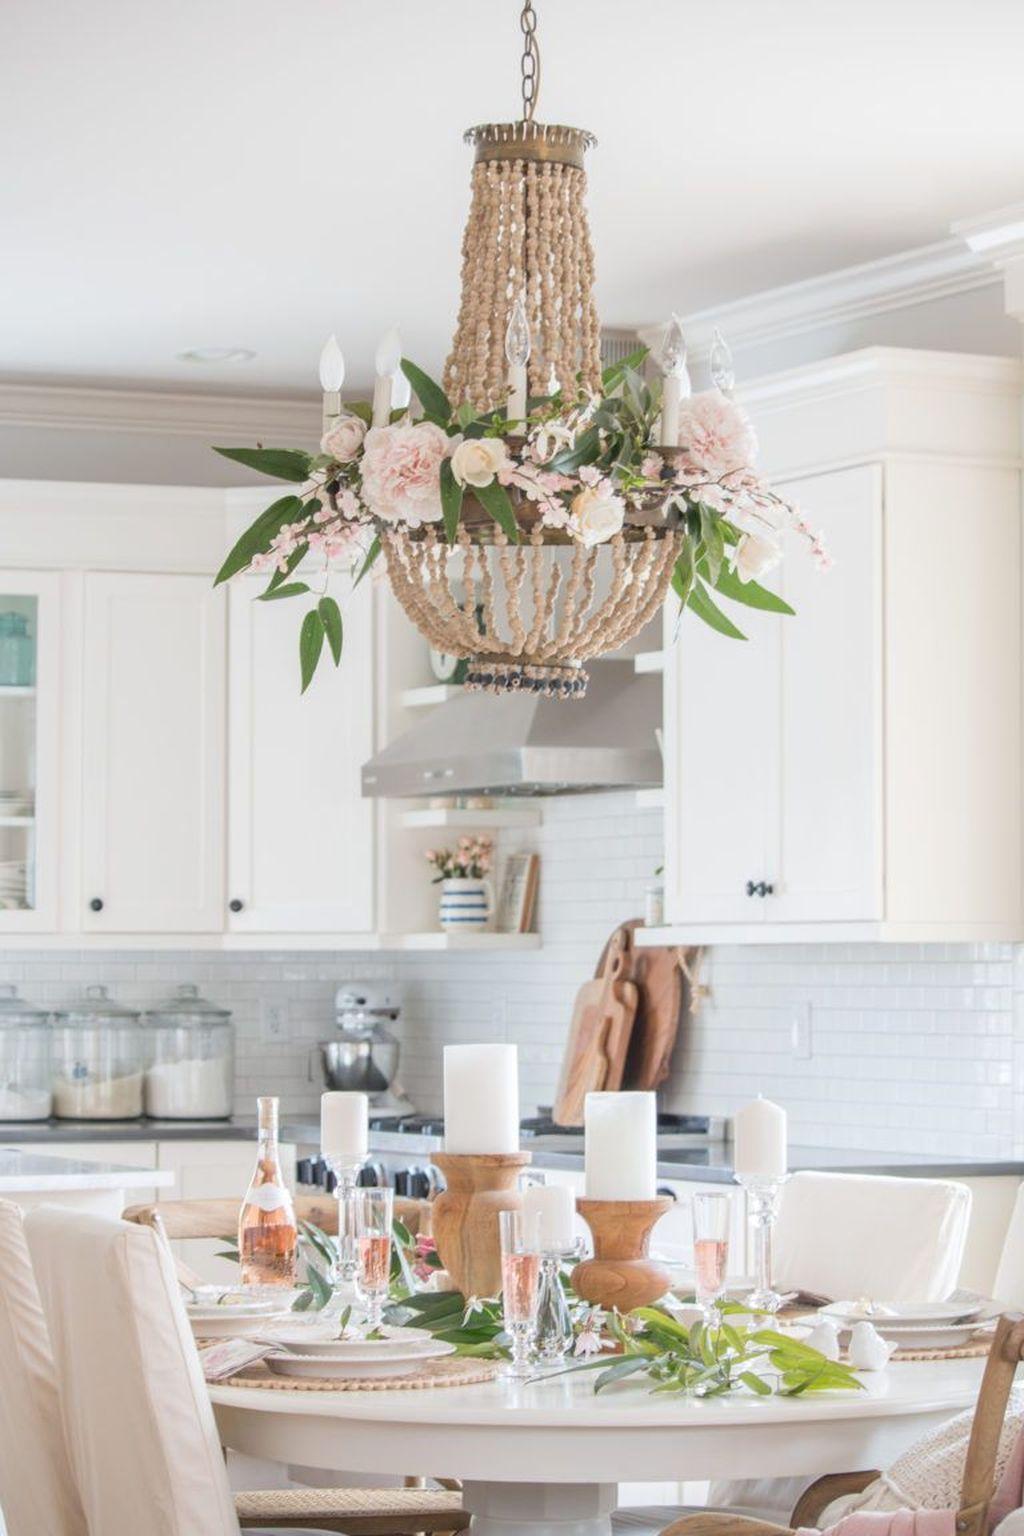 The Best Farmhouse Style Spring Tablescape Decor Ideas 13